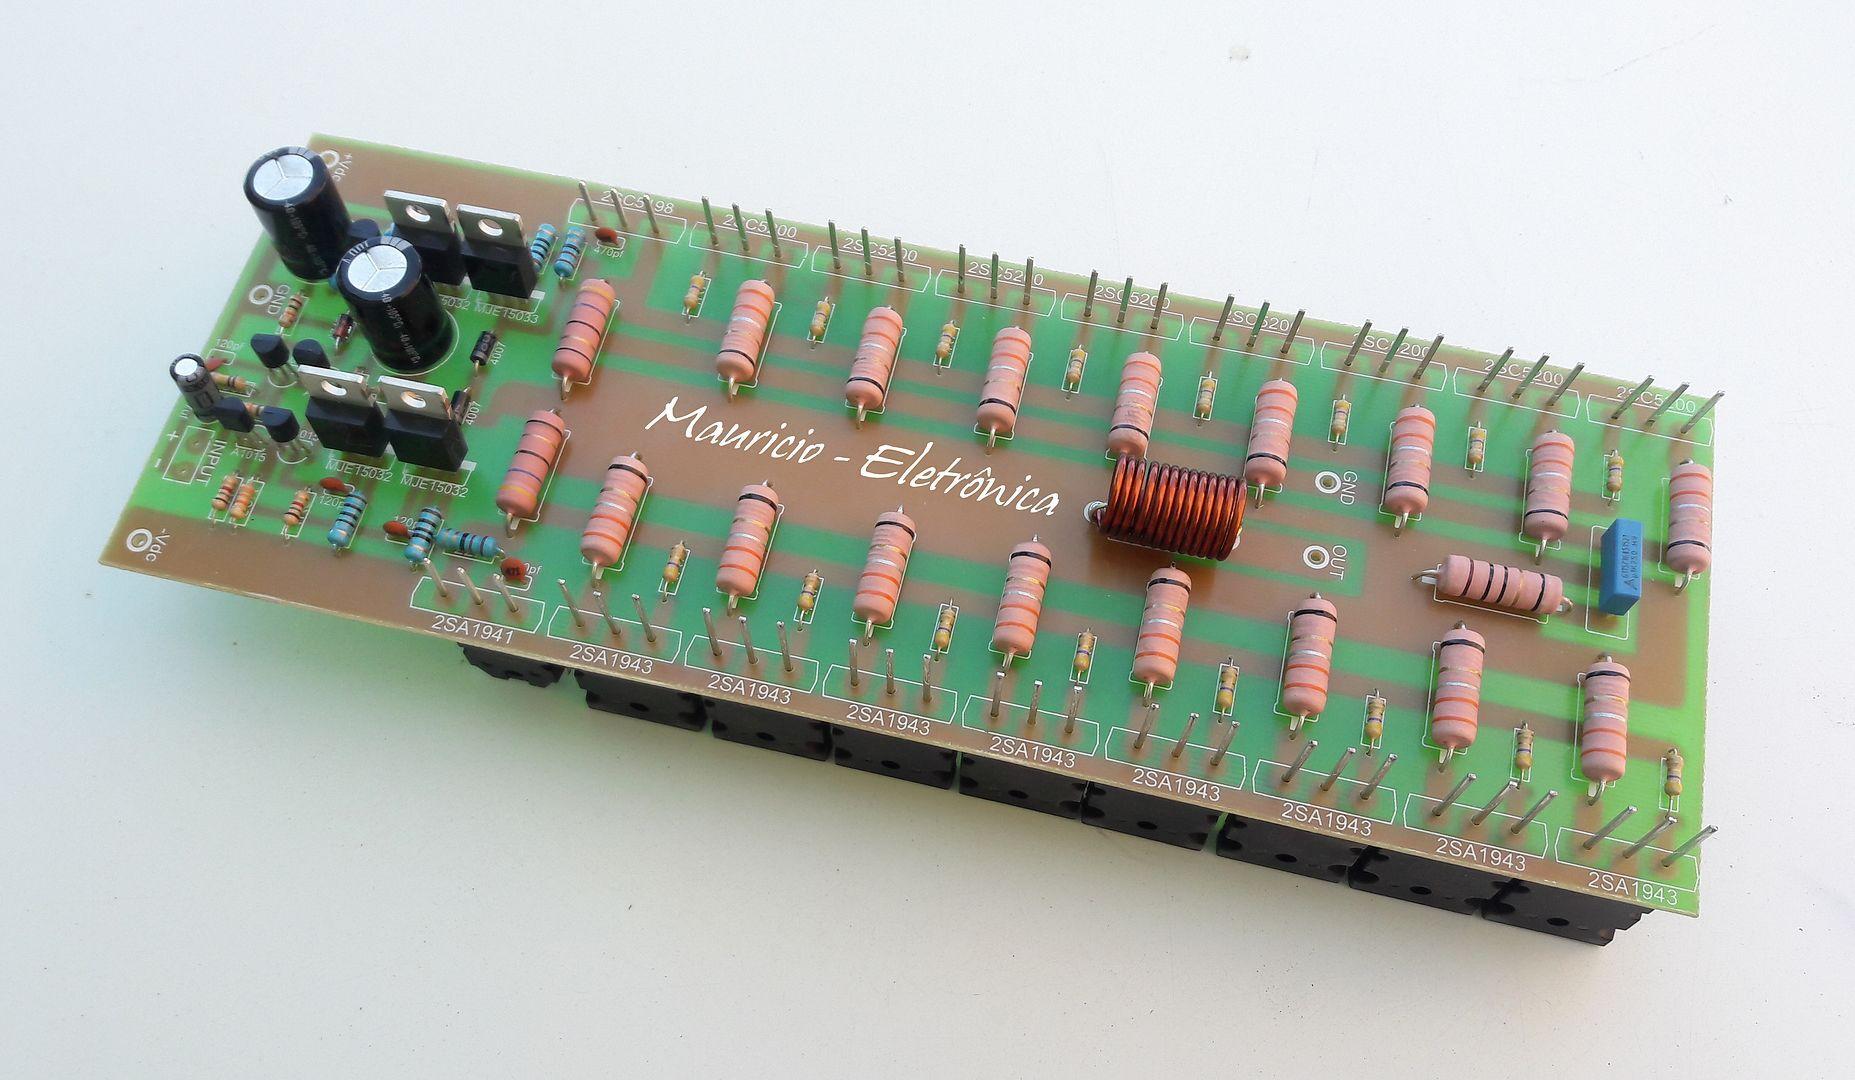 Kit Placa Componentes Para Montar Amplificador 1600w 2 Ohms Kit